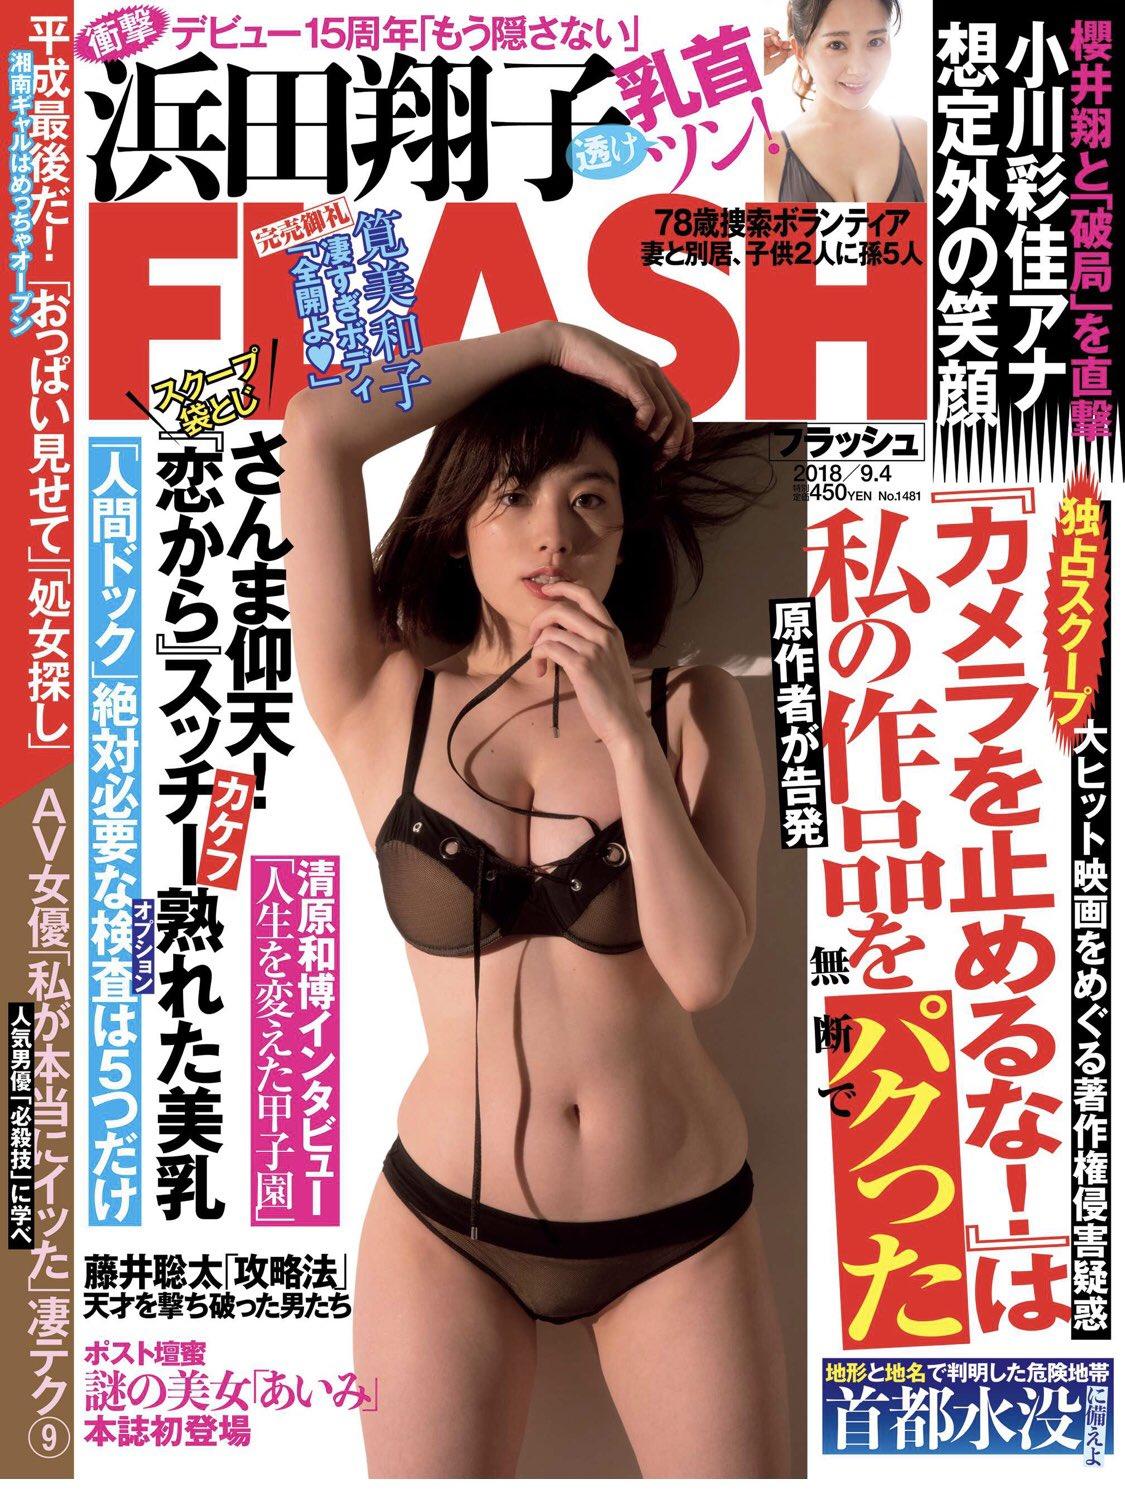 kakei_miwako207.jpg